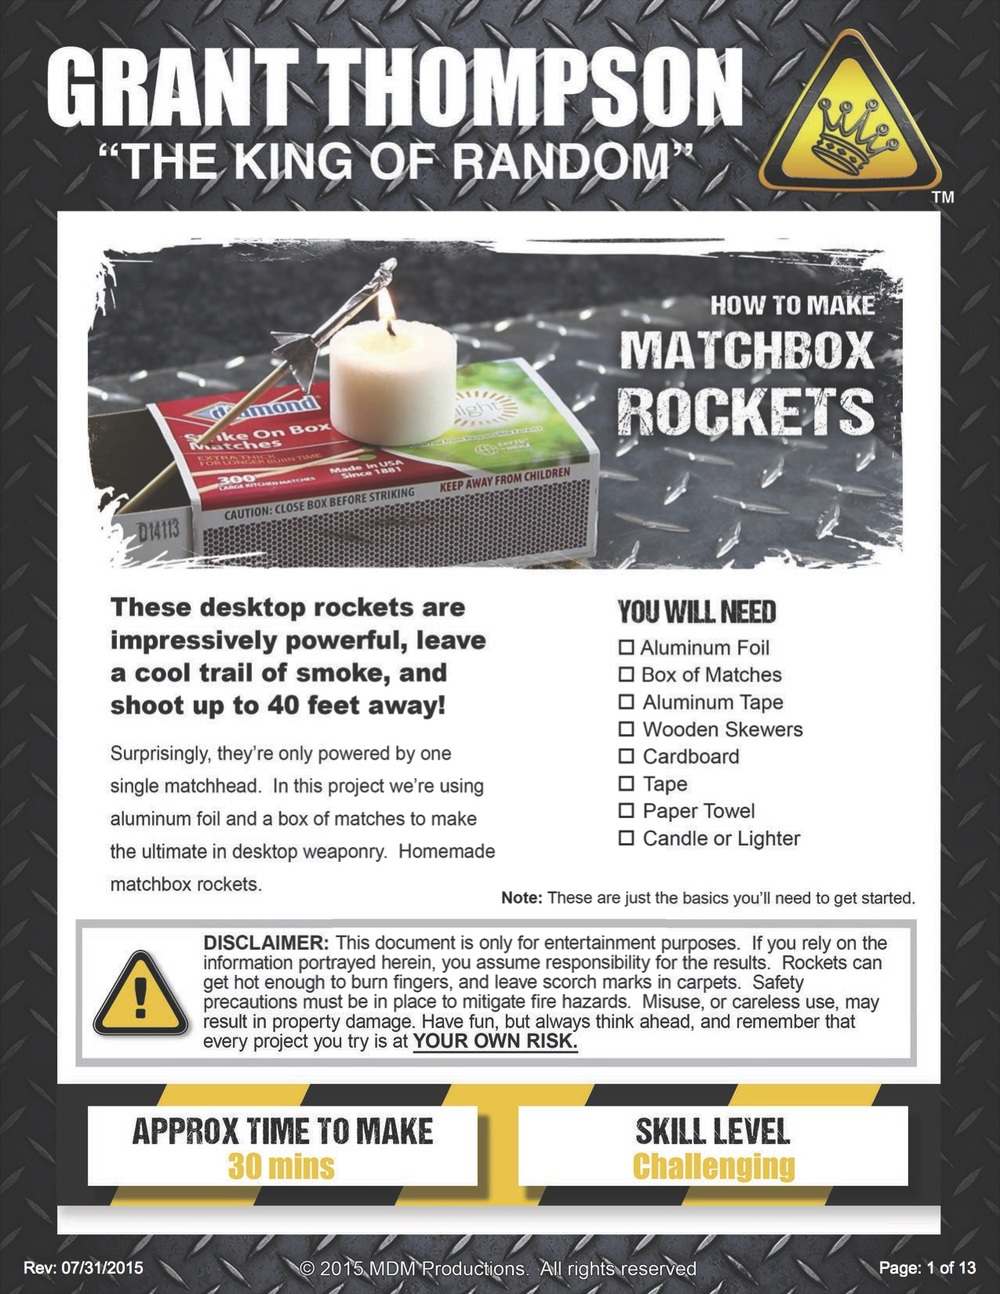 Matchbox+Rockets+Thumbnail?format=500w grant thompson foam cutter wire diagram grant wiring diagrams Hot Wire Foam Cutter Home Depot at alyssarenee.co